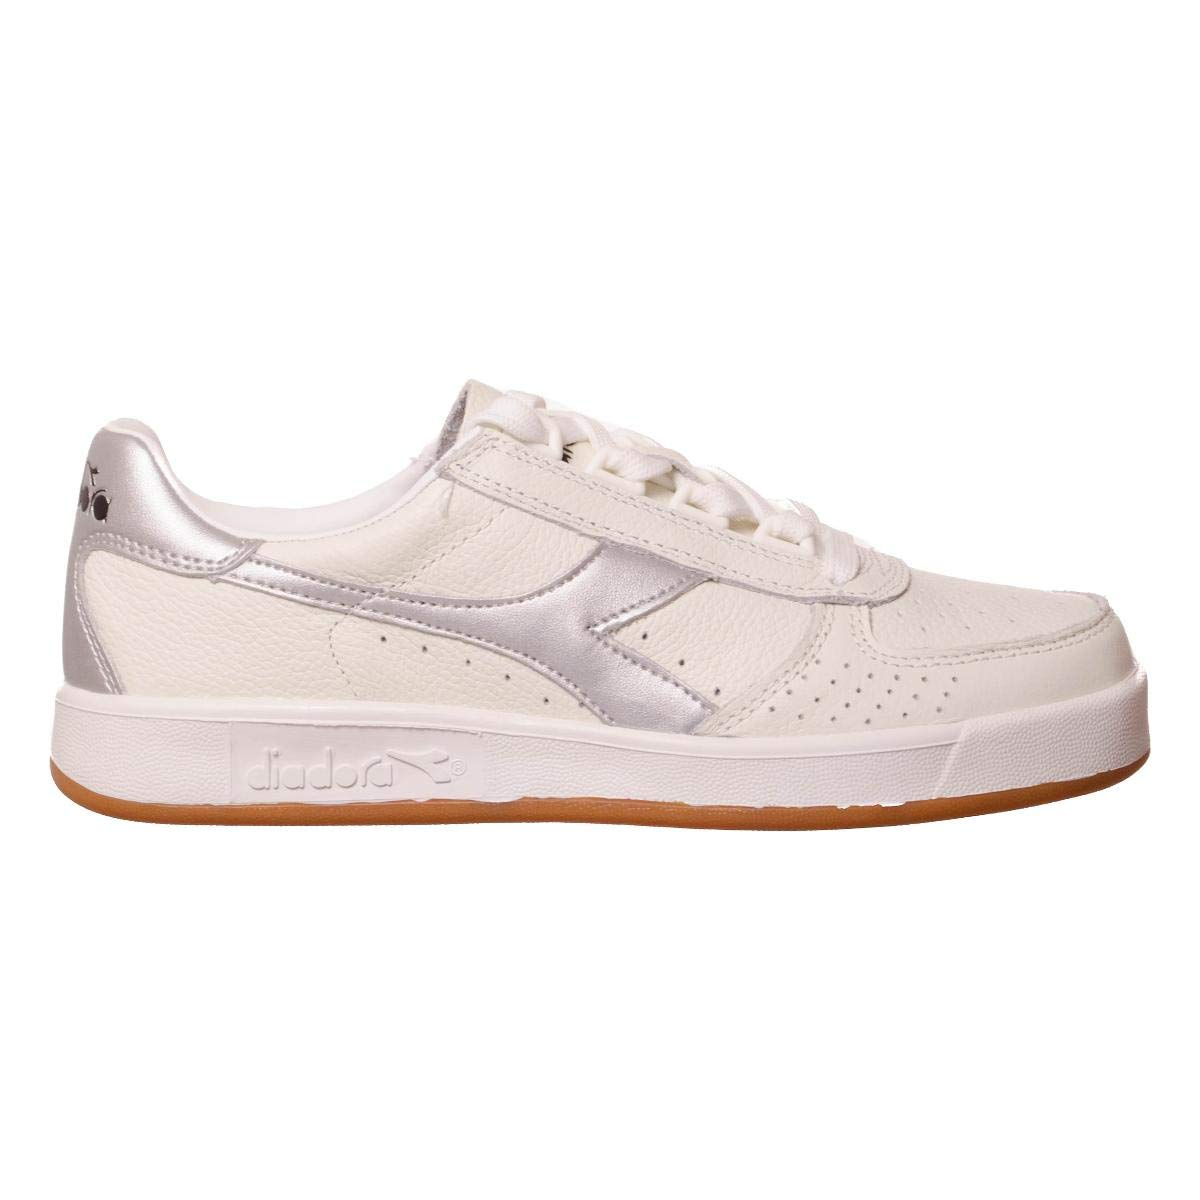 Diadora - - - scarpe da ginnastica B.ELITE L per uomo e donna   vendita di liquidazione  88ec78